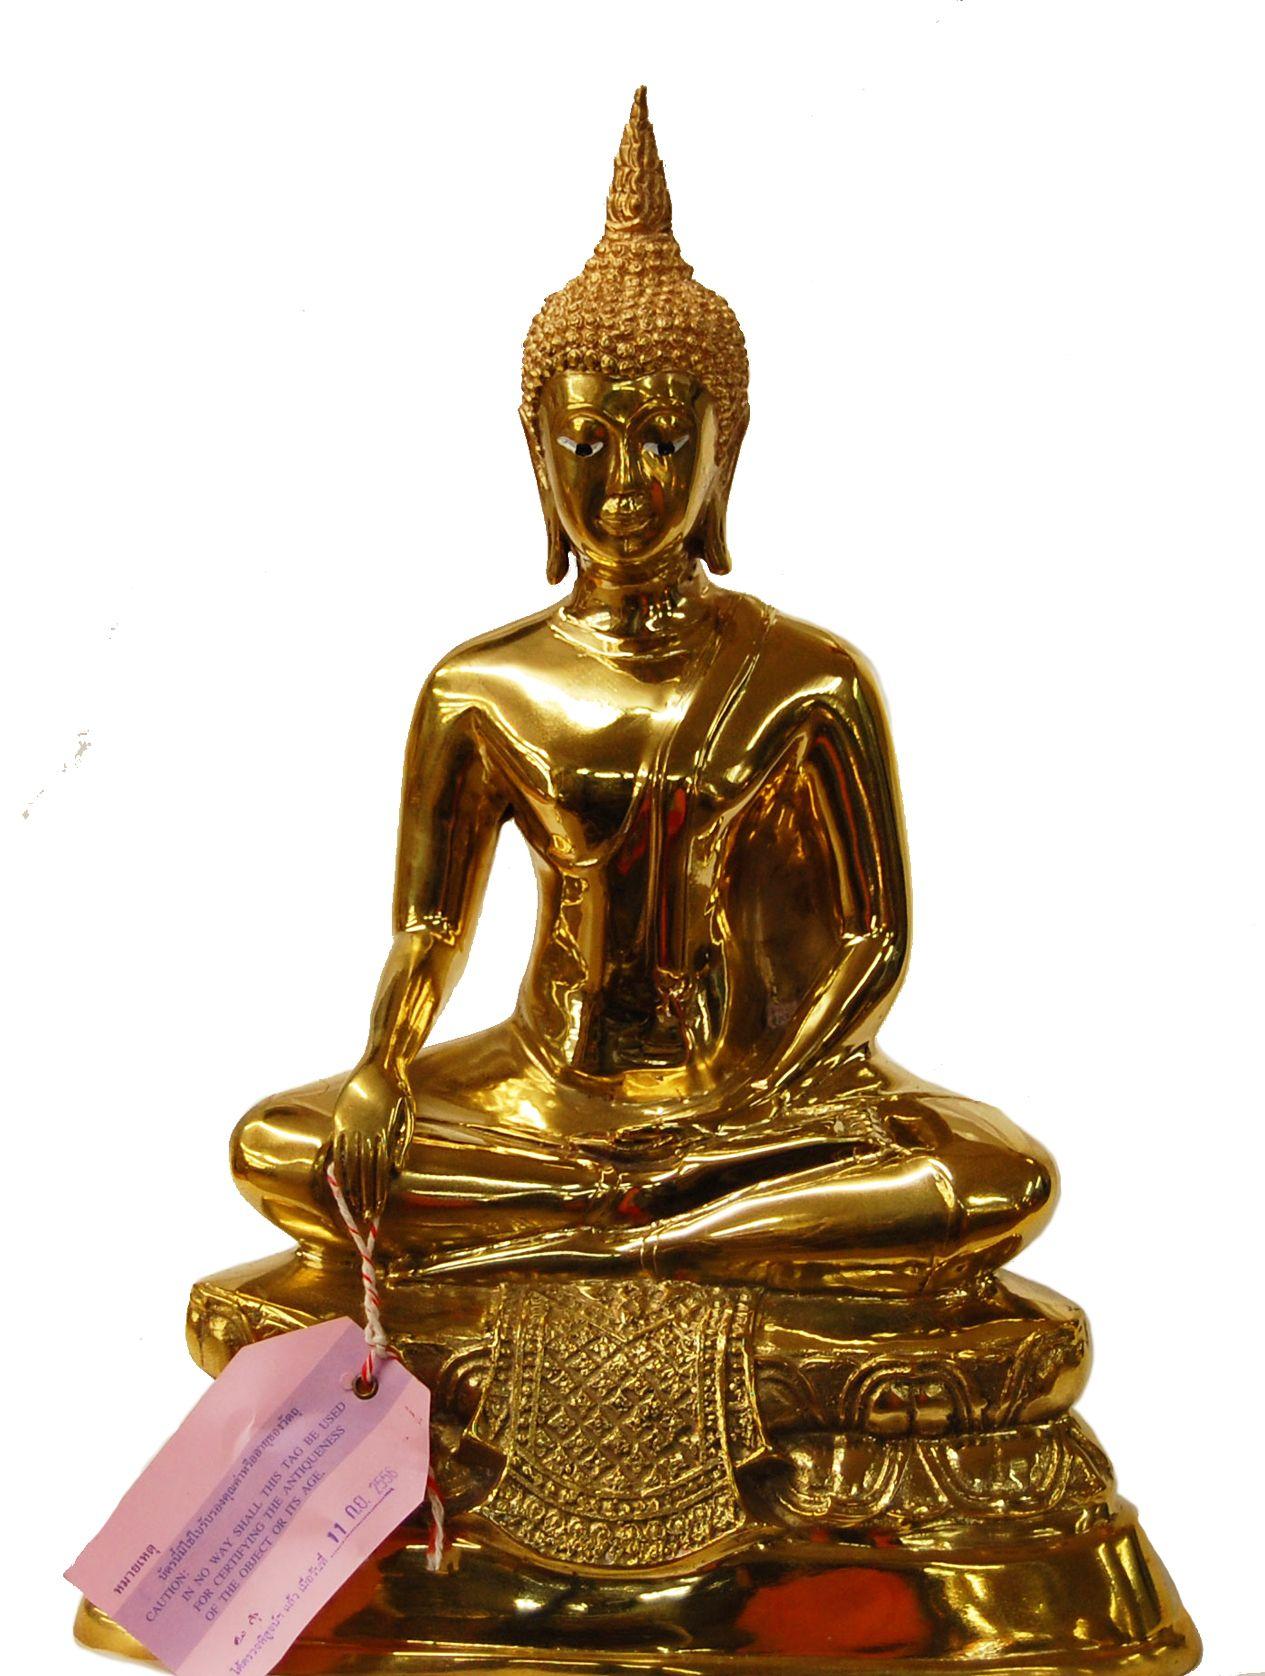 Buddha Statue Eighth Day Statue Buddha The Eighth Day